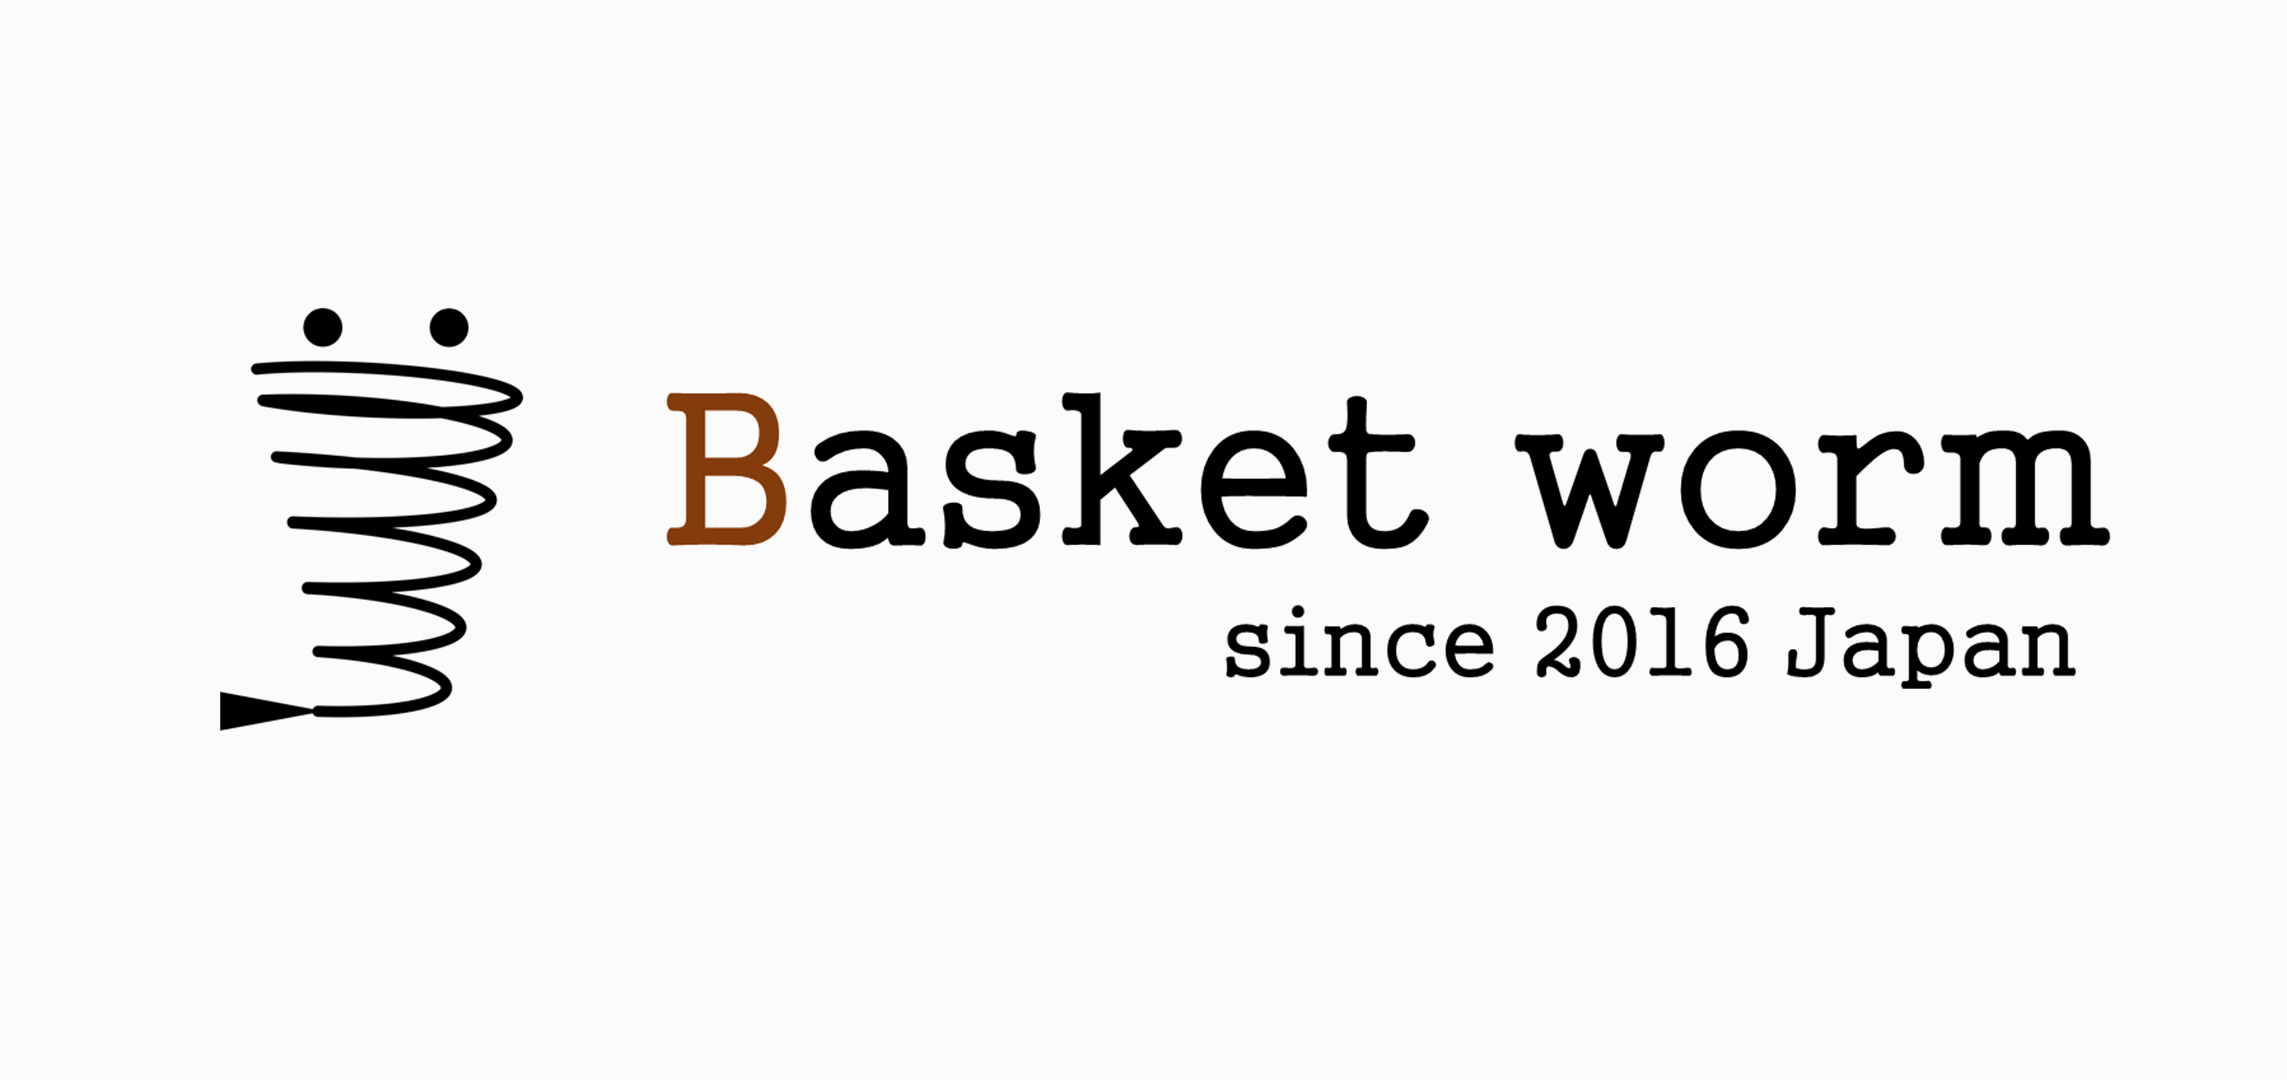 Basket worm バスケットワーム|自閉症を持つ子供のための衣服 商品企画・通販